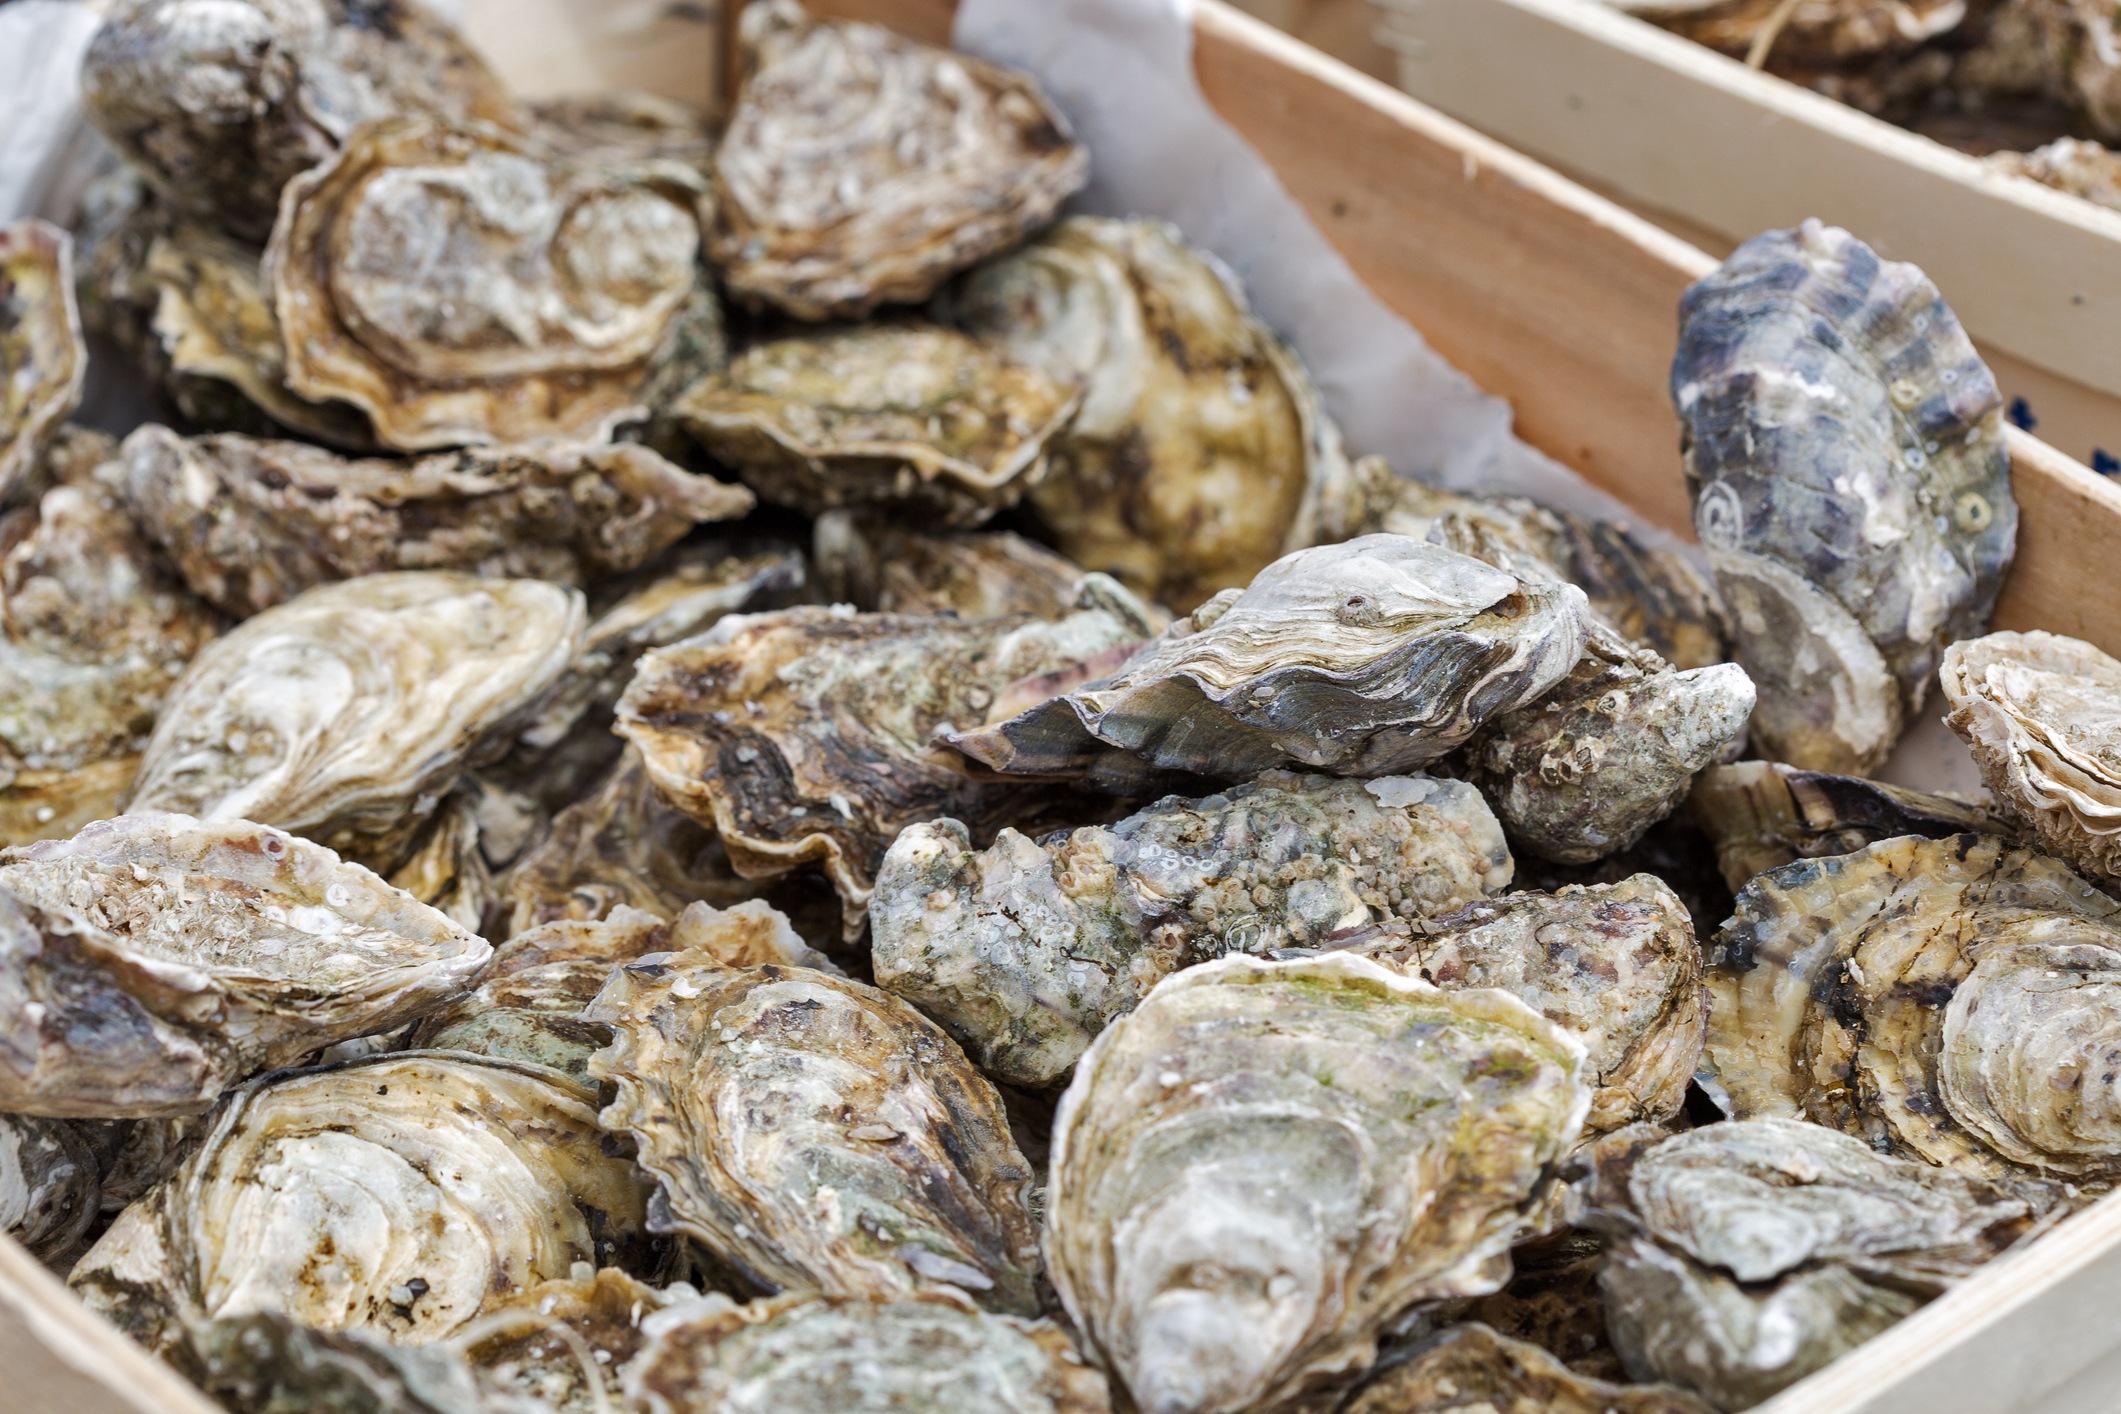 closeup of oyster shells